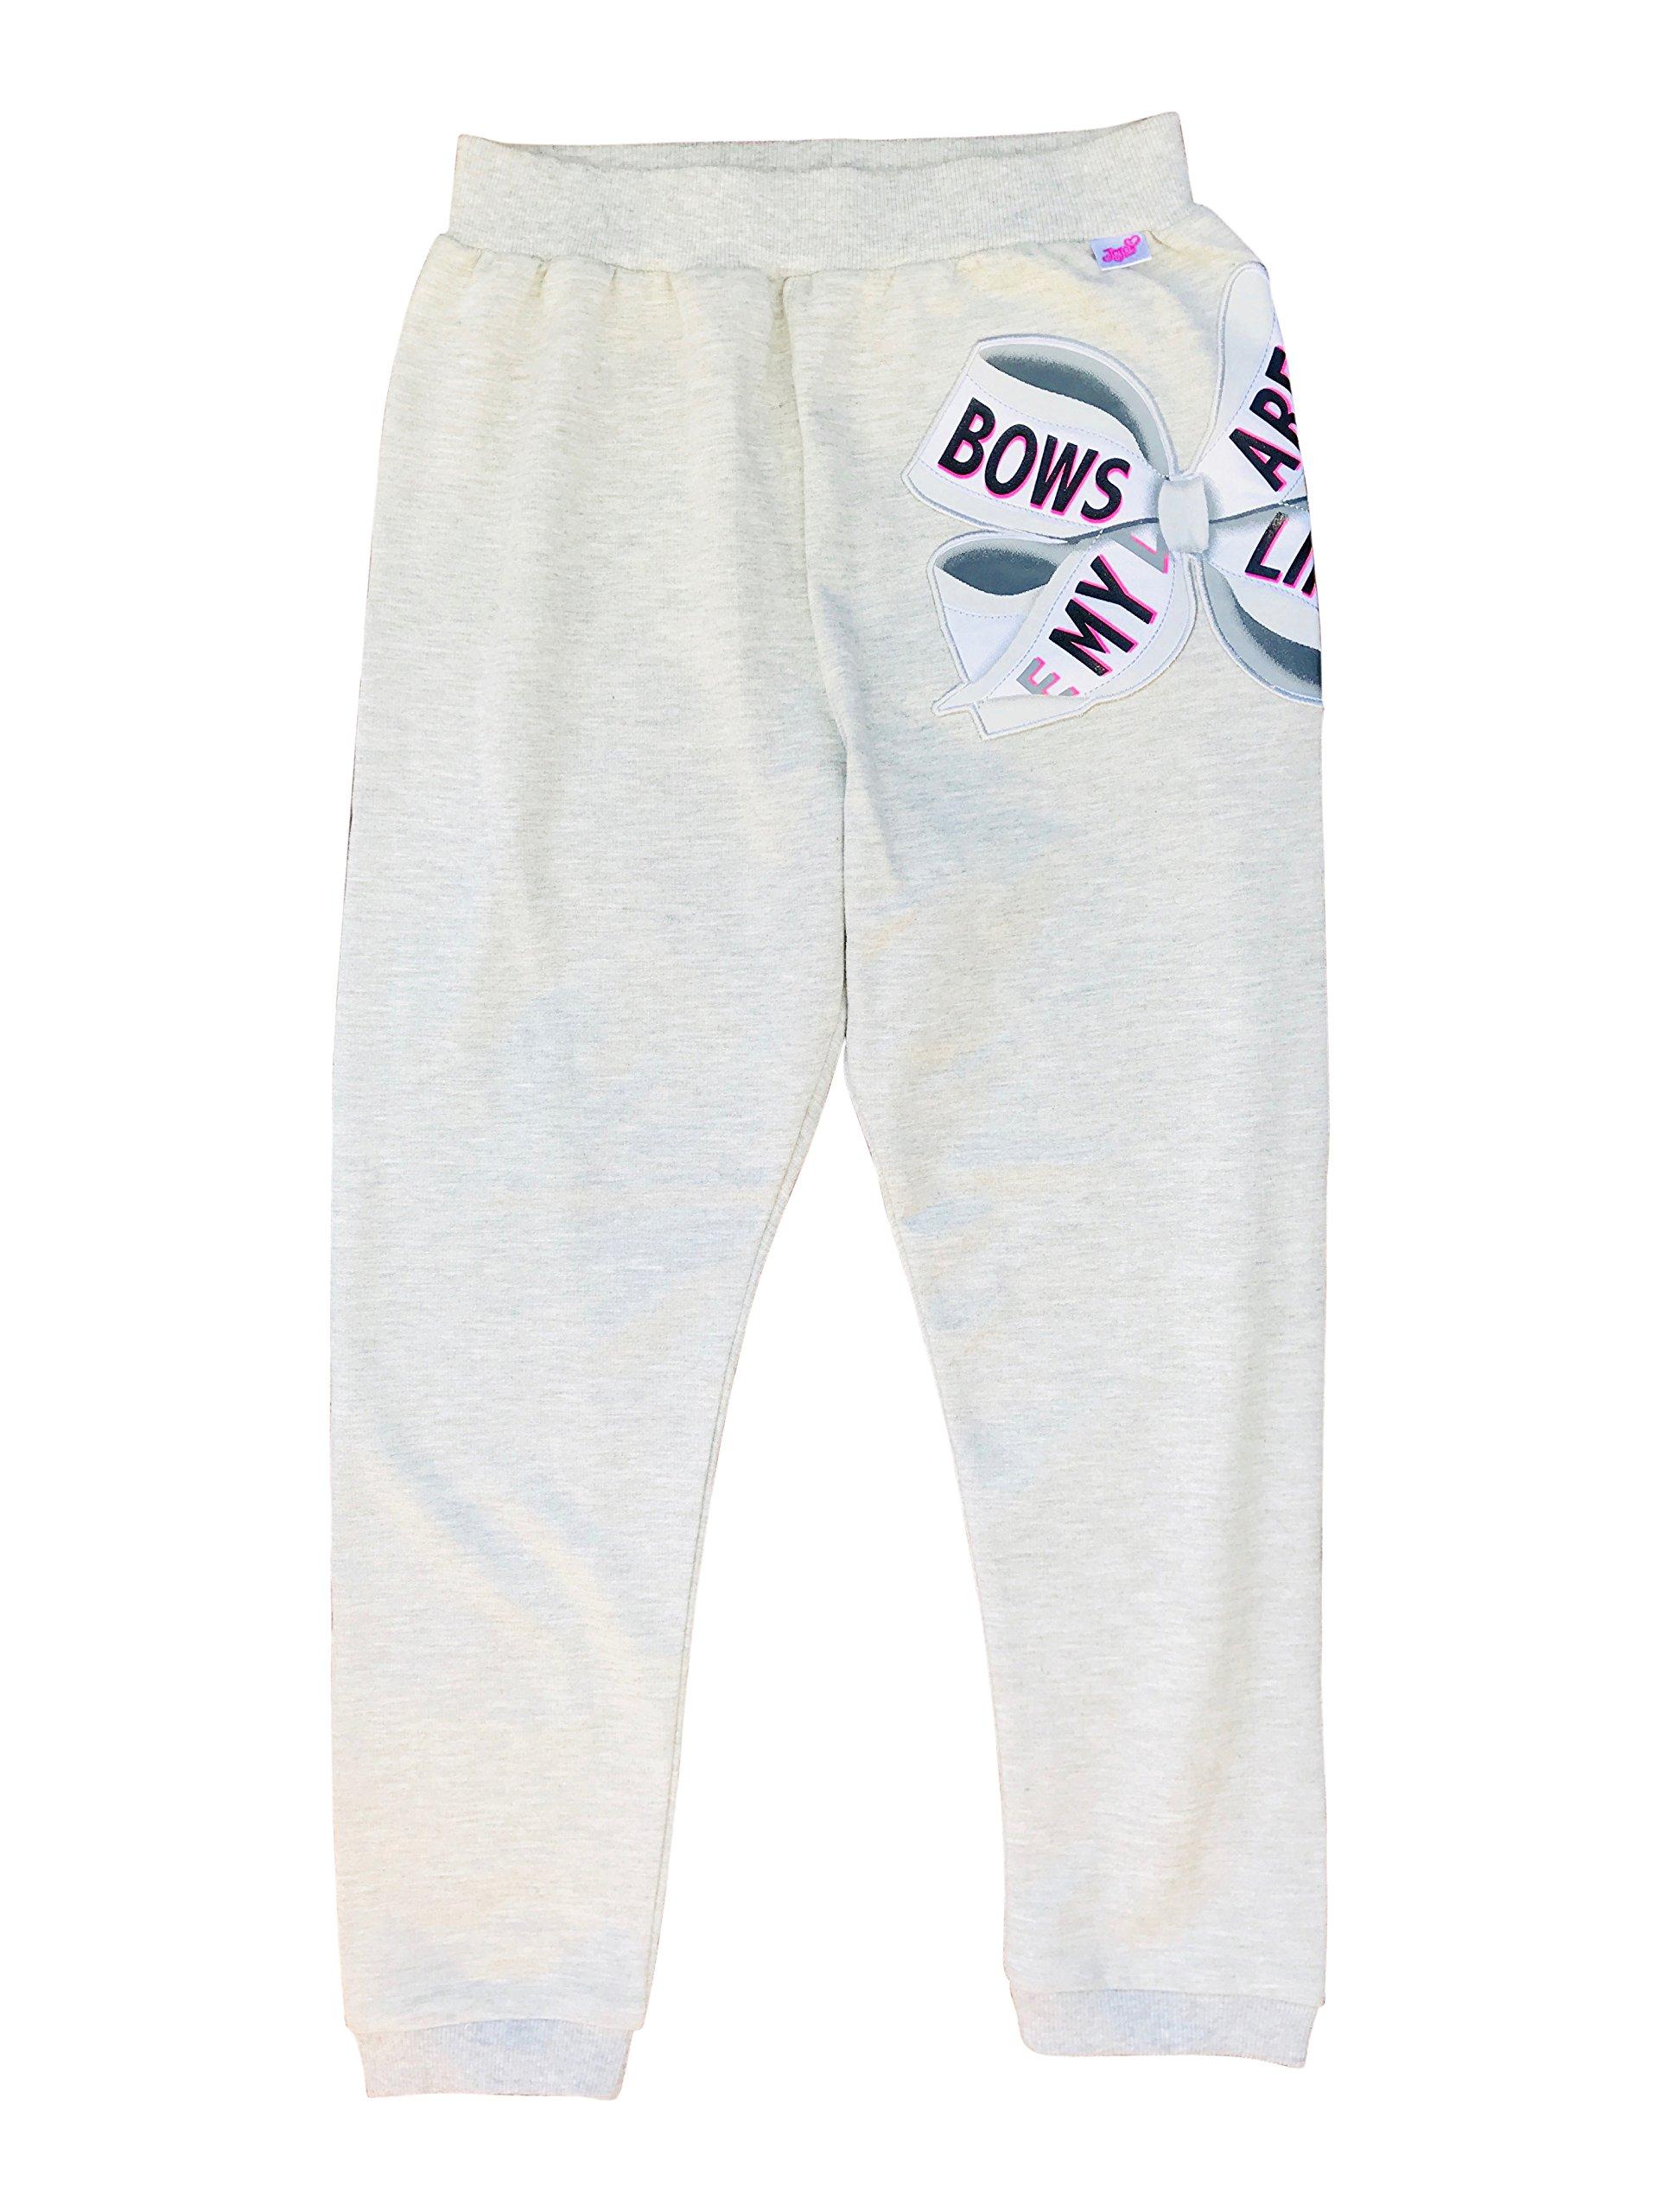 jojo siwa ''Bows are My Life Heathered Sweatpants Gray Nickelodeon Size 6